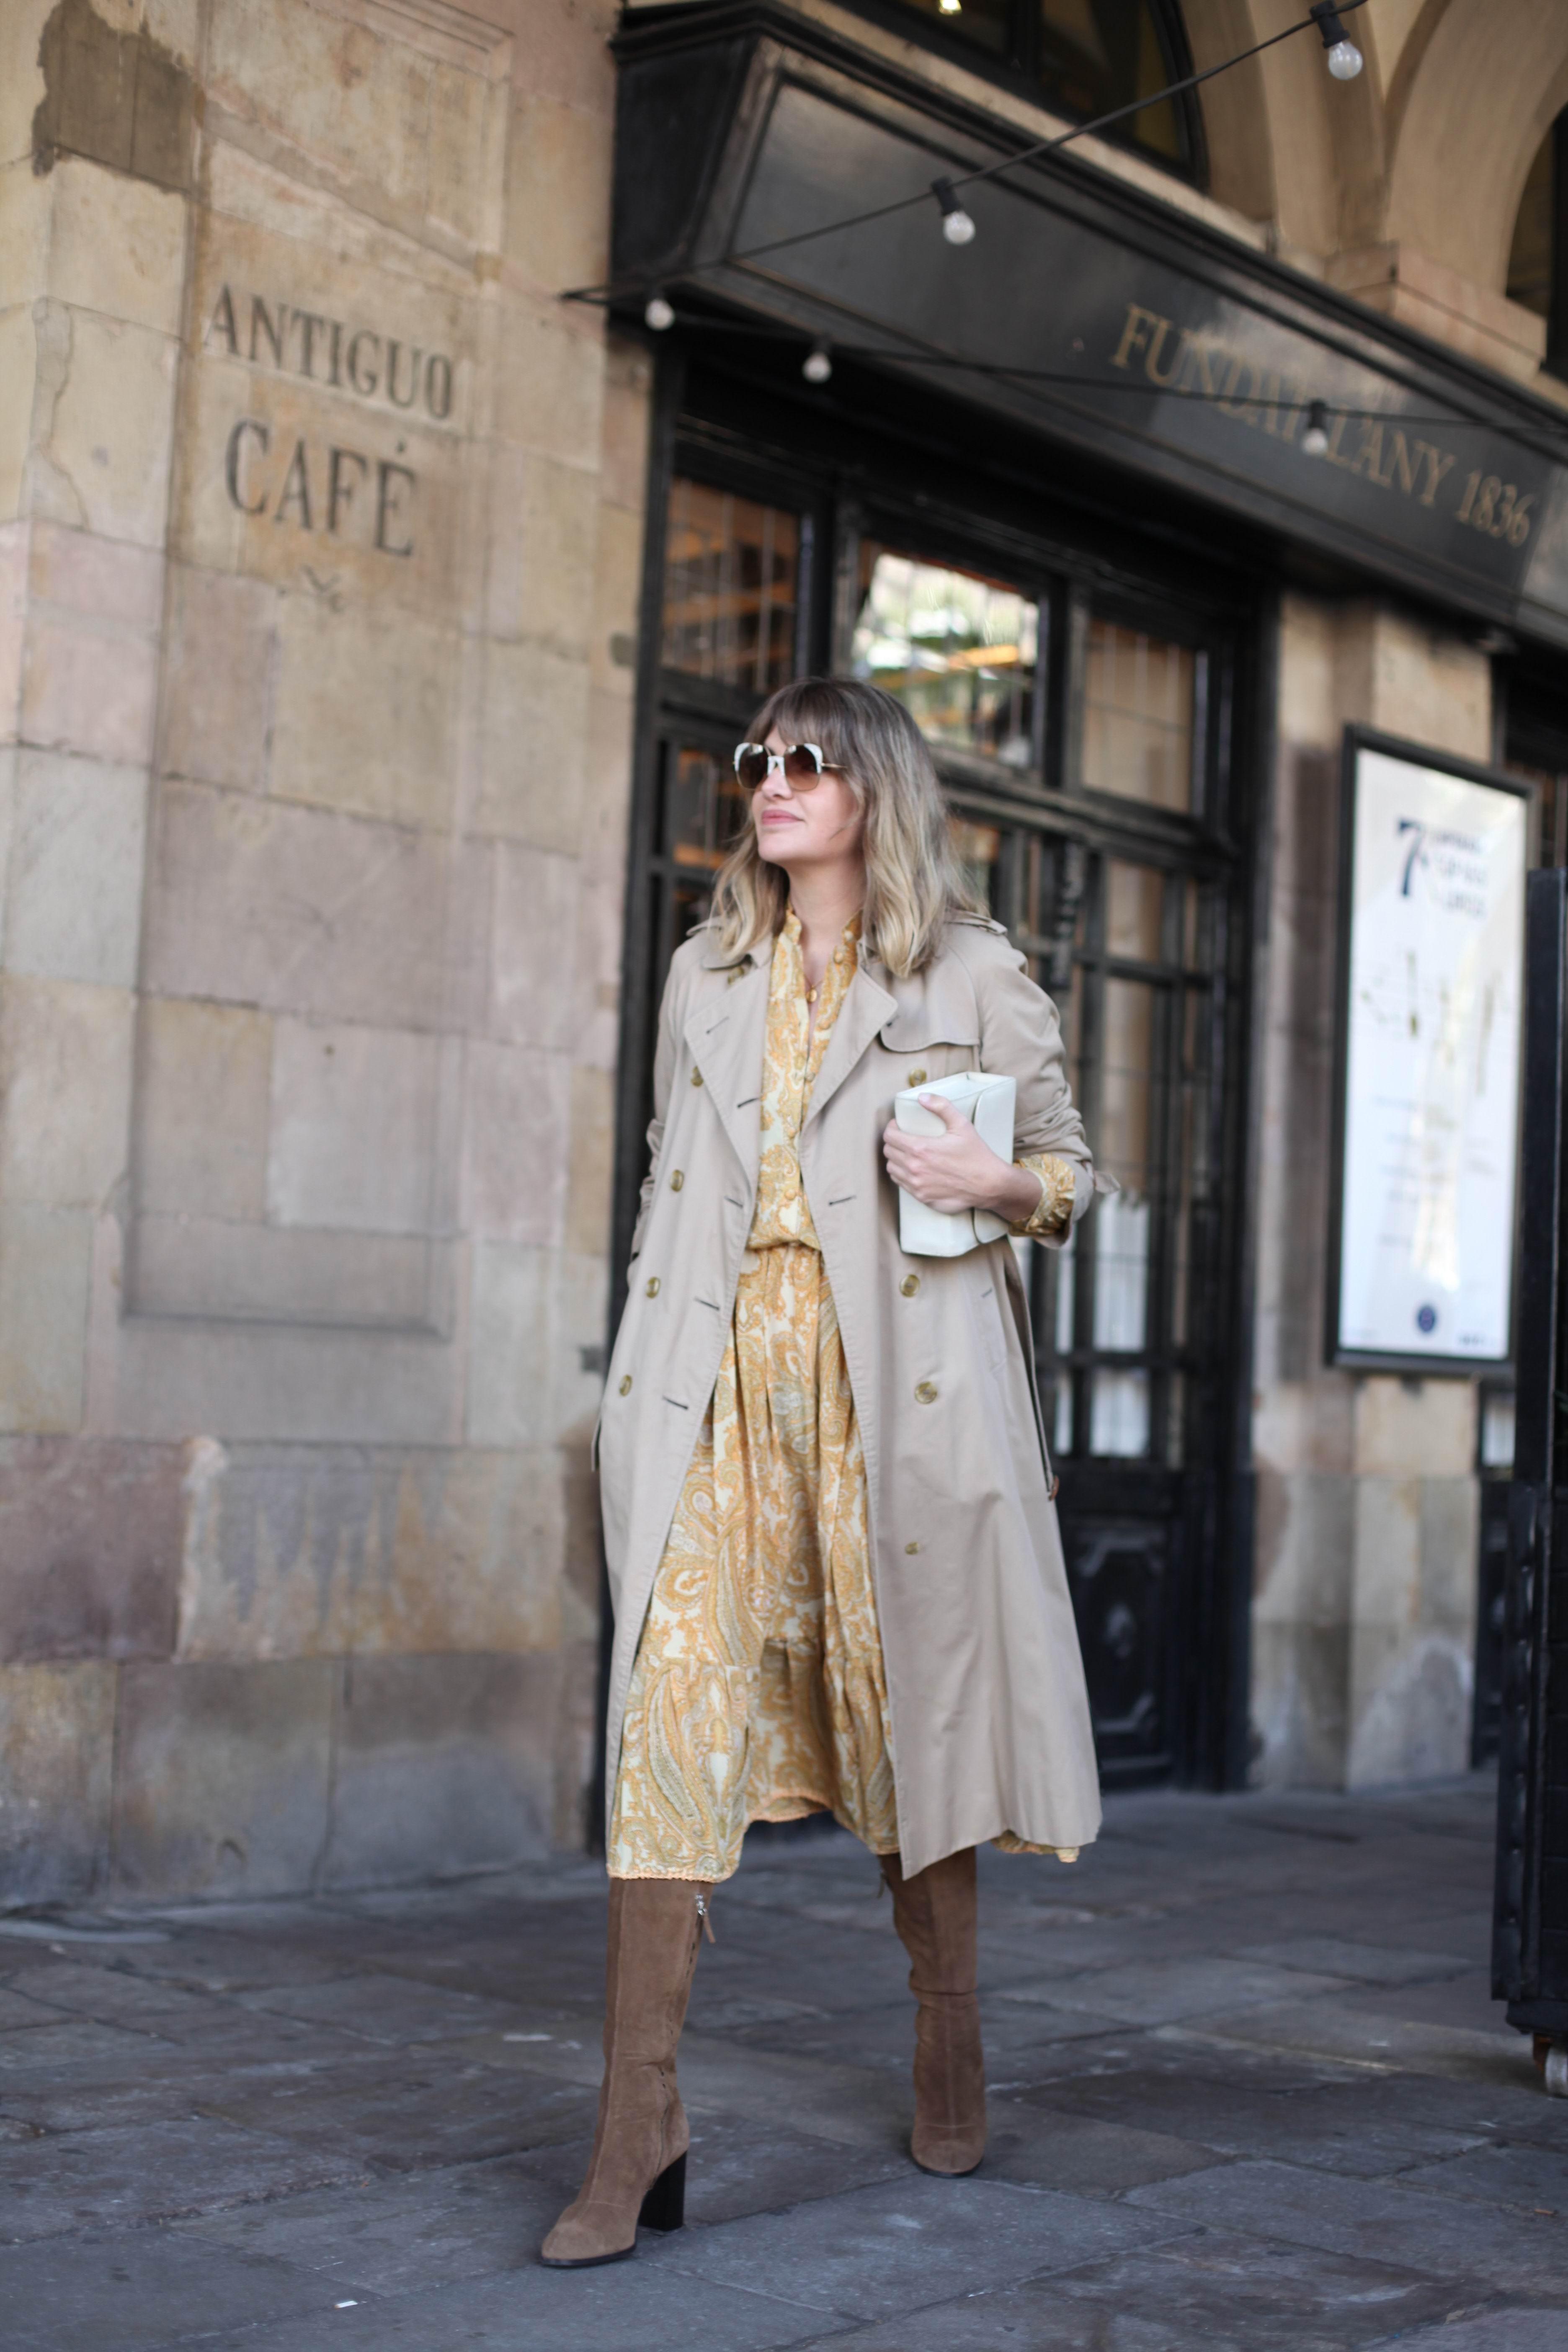 YELLOW PAISLEY DRESS-69178-mydailystyle